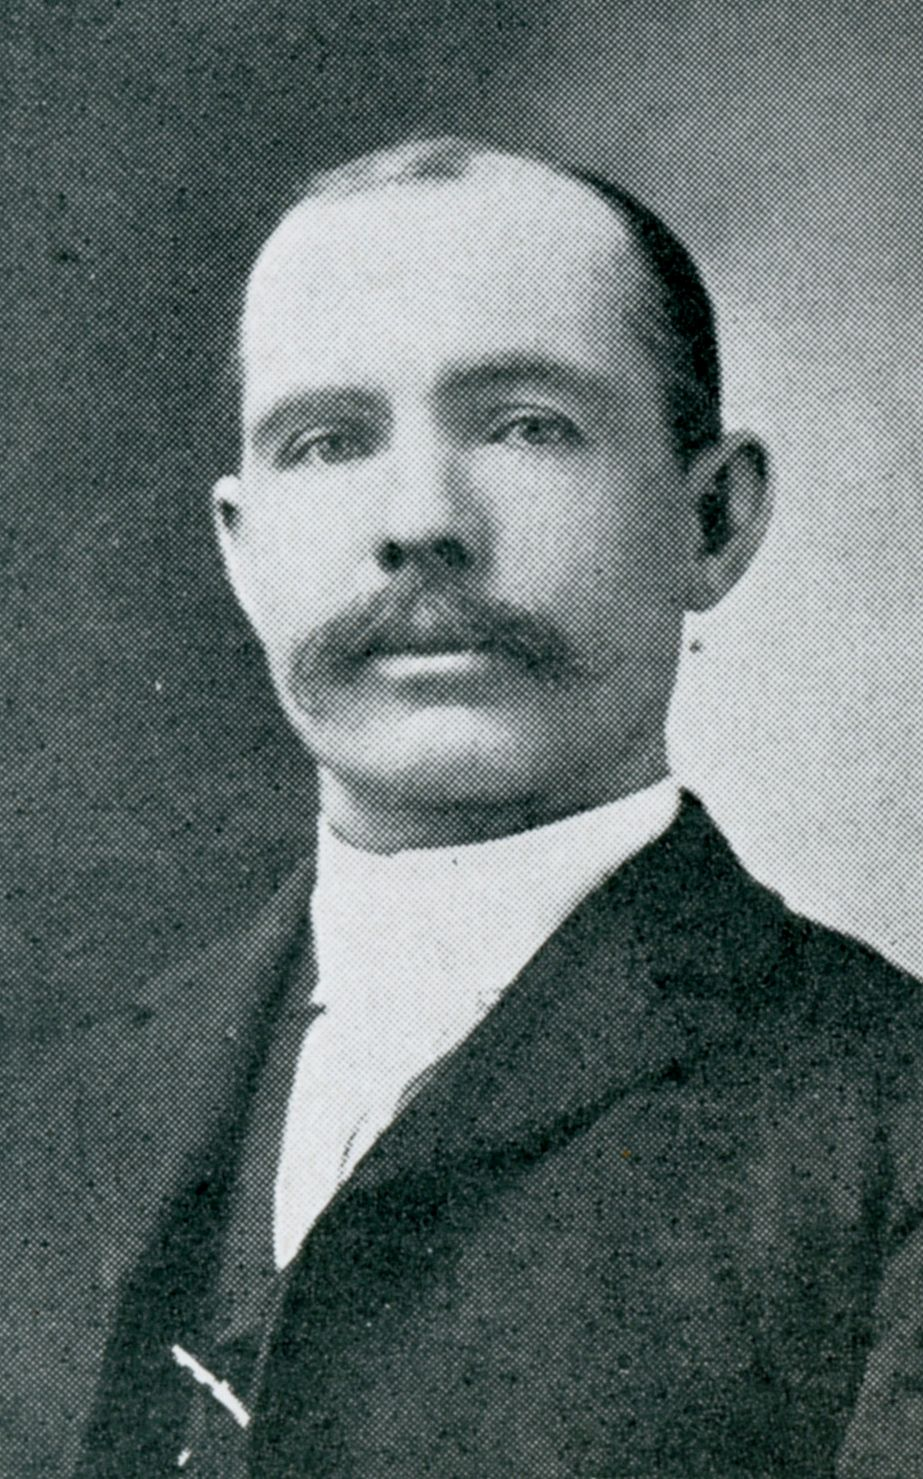 Baxter, John McKinnon